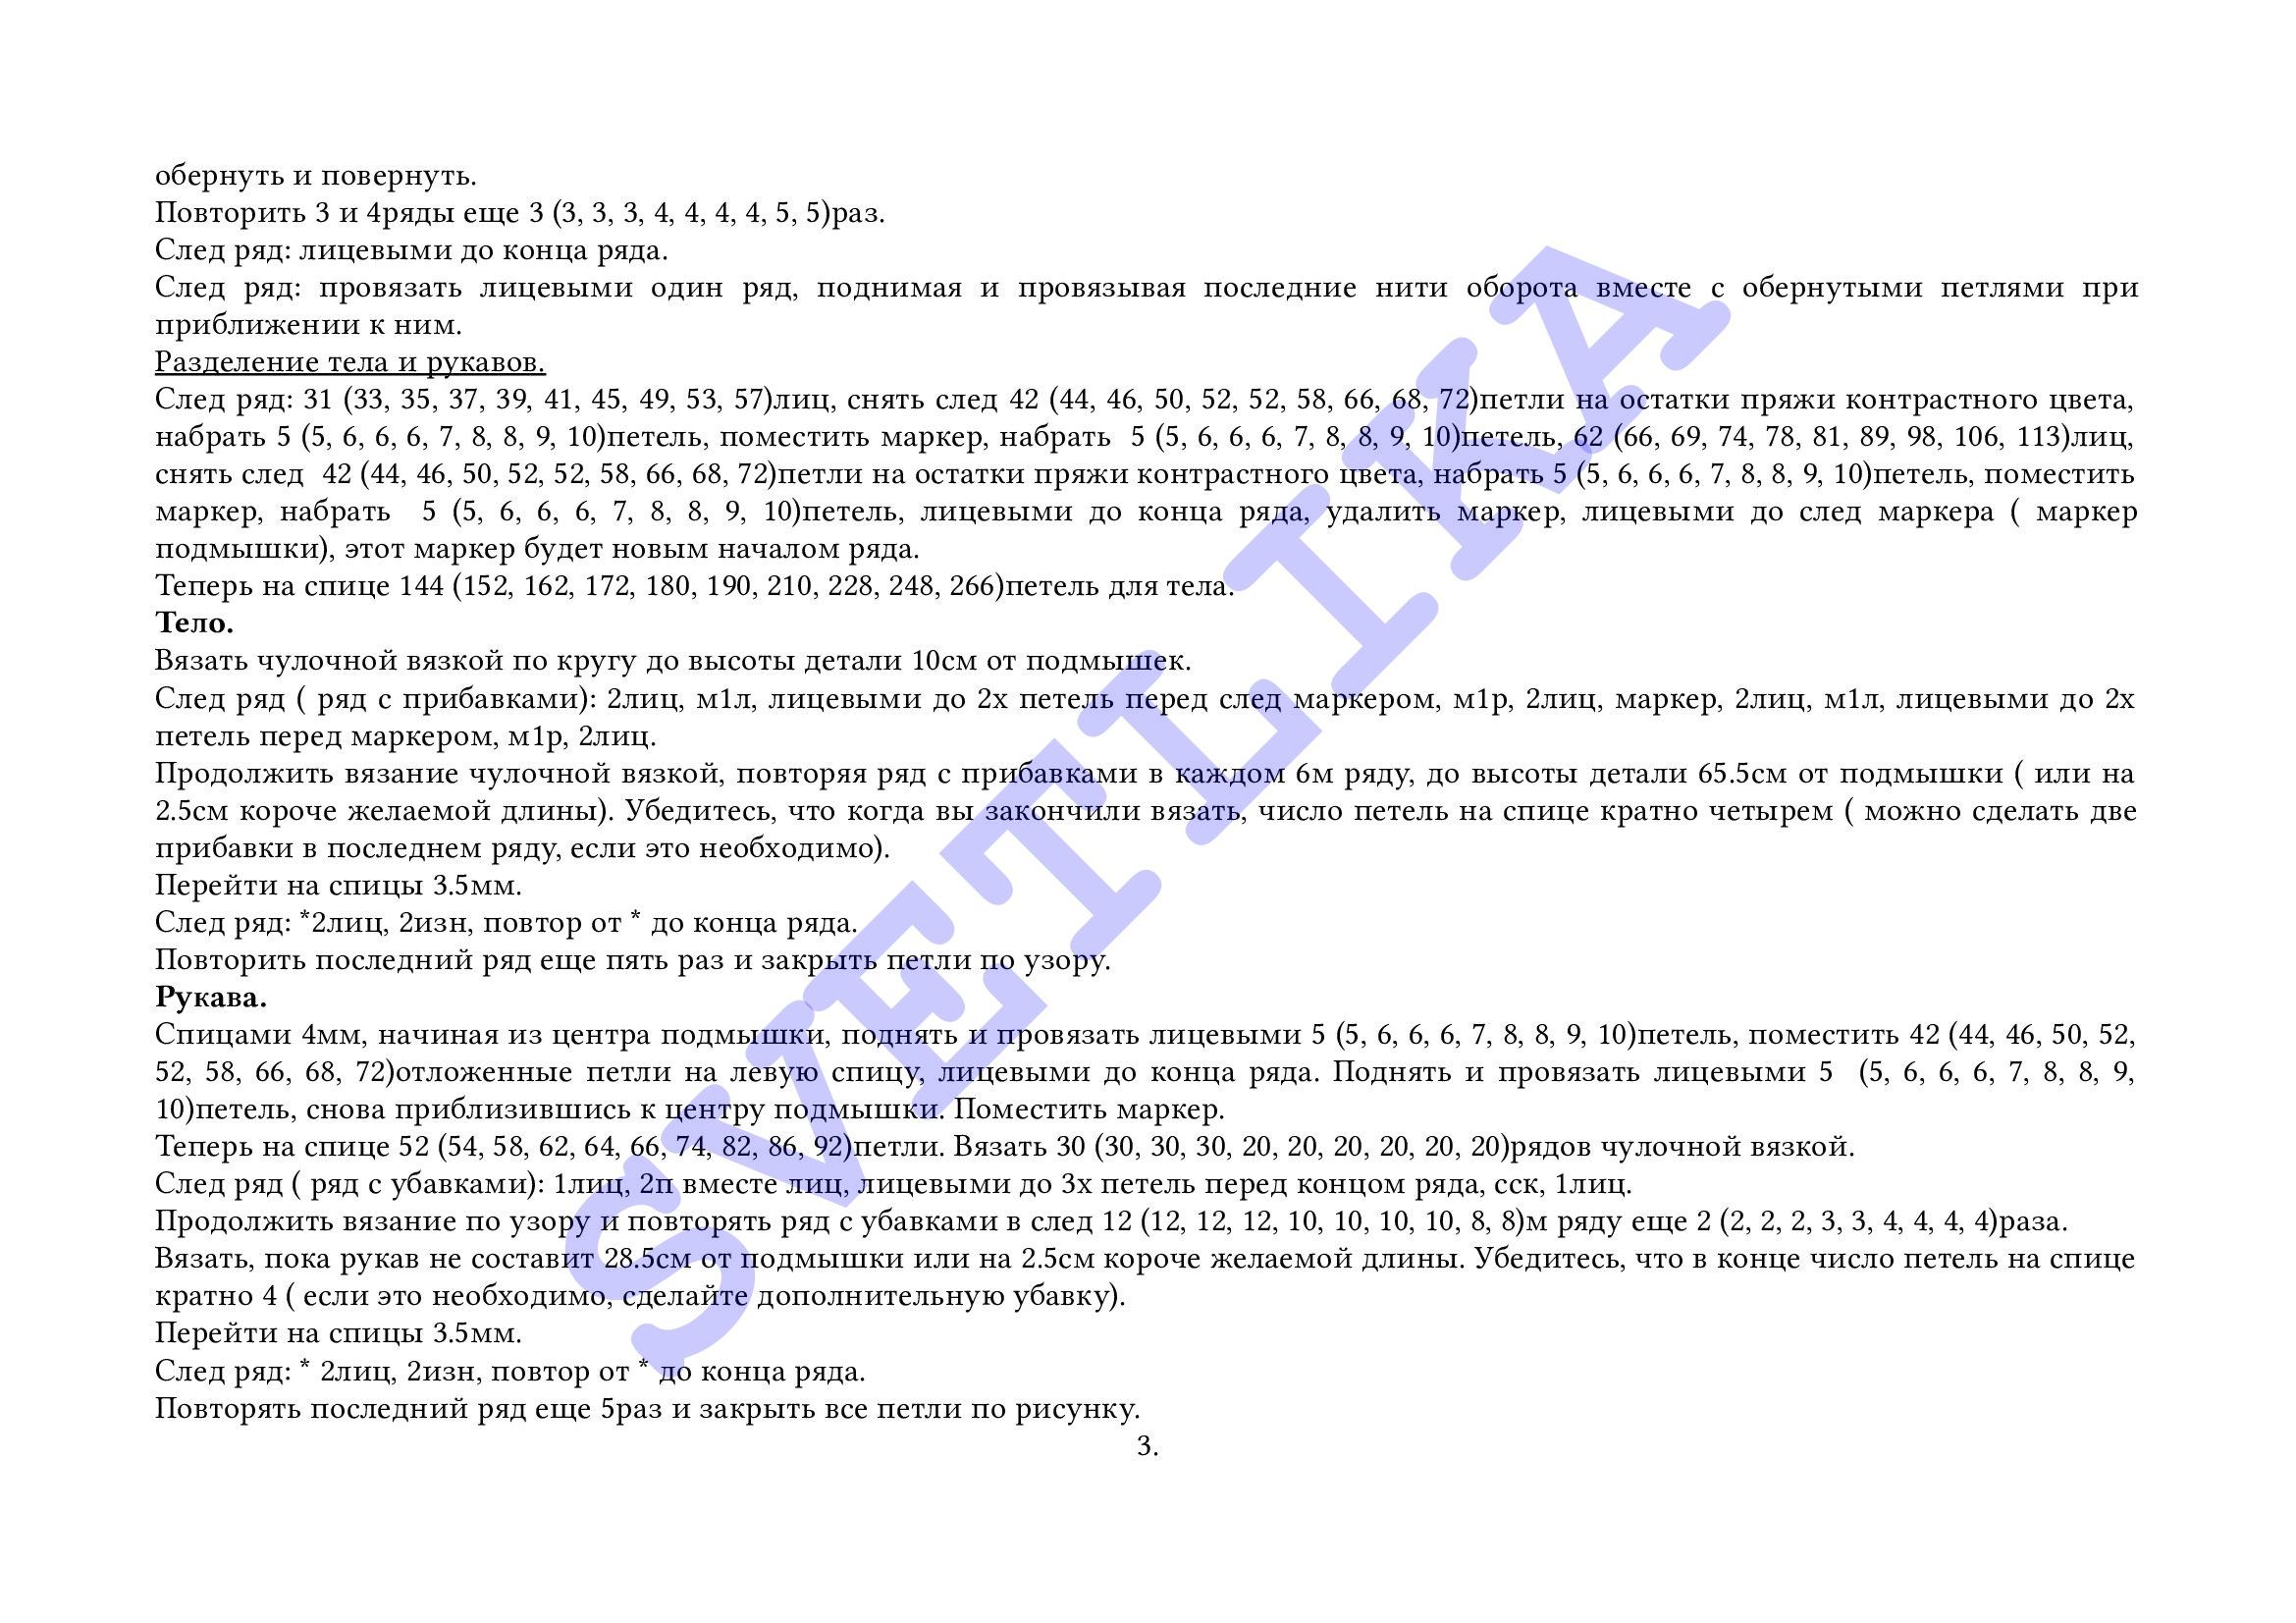 https://img-fotki.yandex.ru/get/9806/125862467.61/0_16e3bc_56335e03_orig